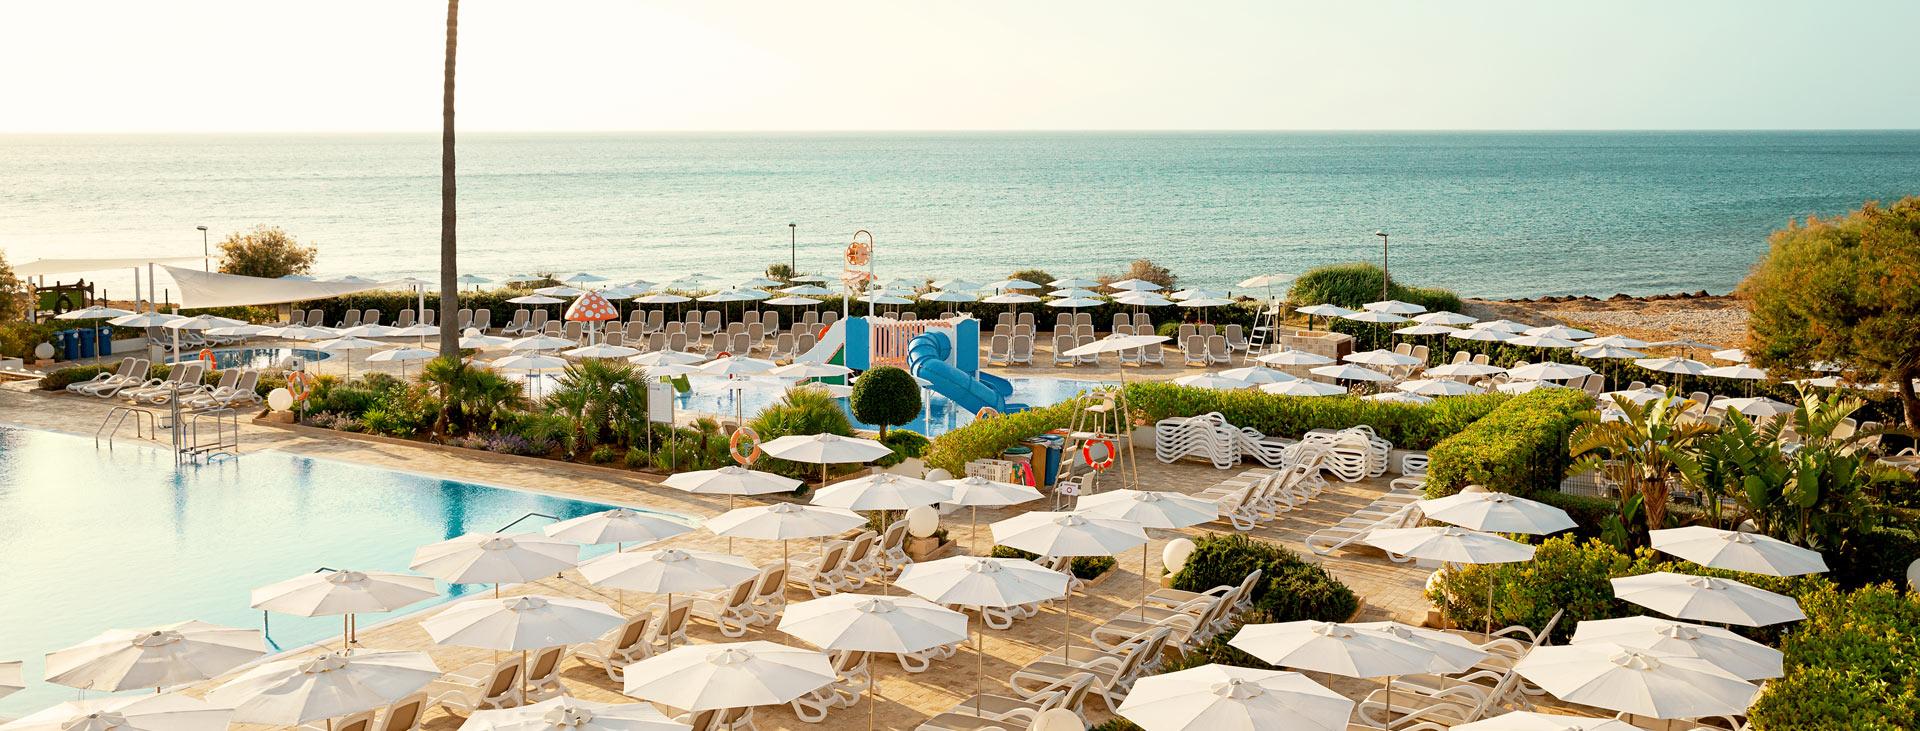 Sunwing Cala Bona Beach, Cala Bona, Mallorca, Espanja